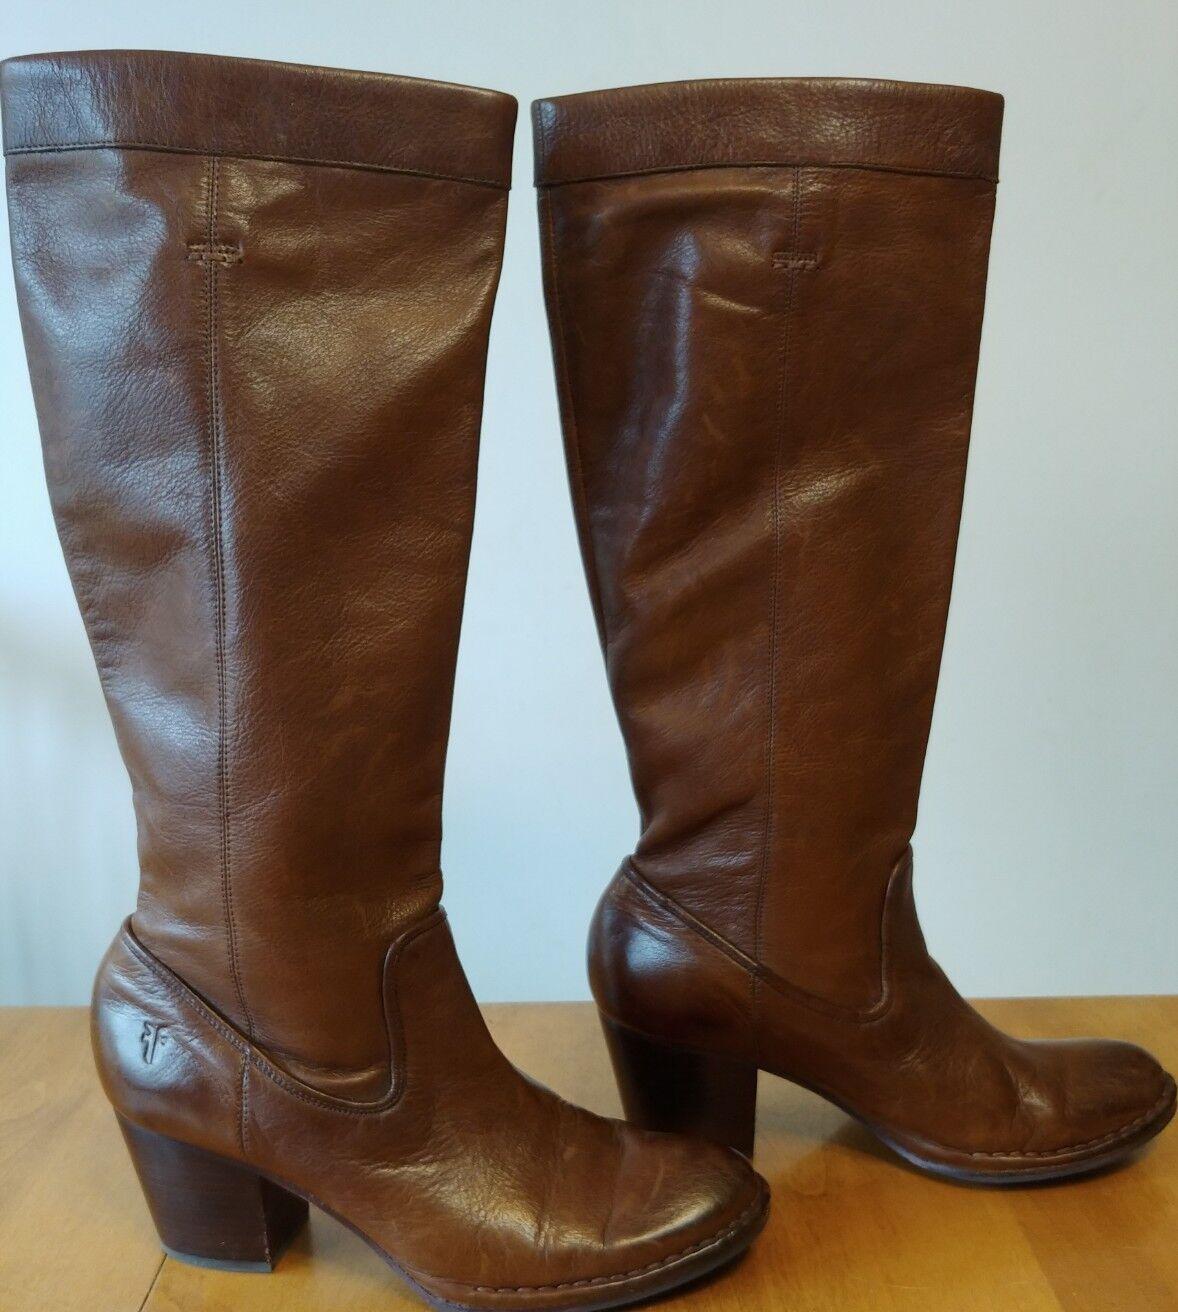 FRYE Rory Scrunch Distressed Stiefel Braun Leder Tall Heeled Stiefel Distressed Größe 9.5 c35f43